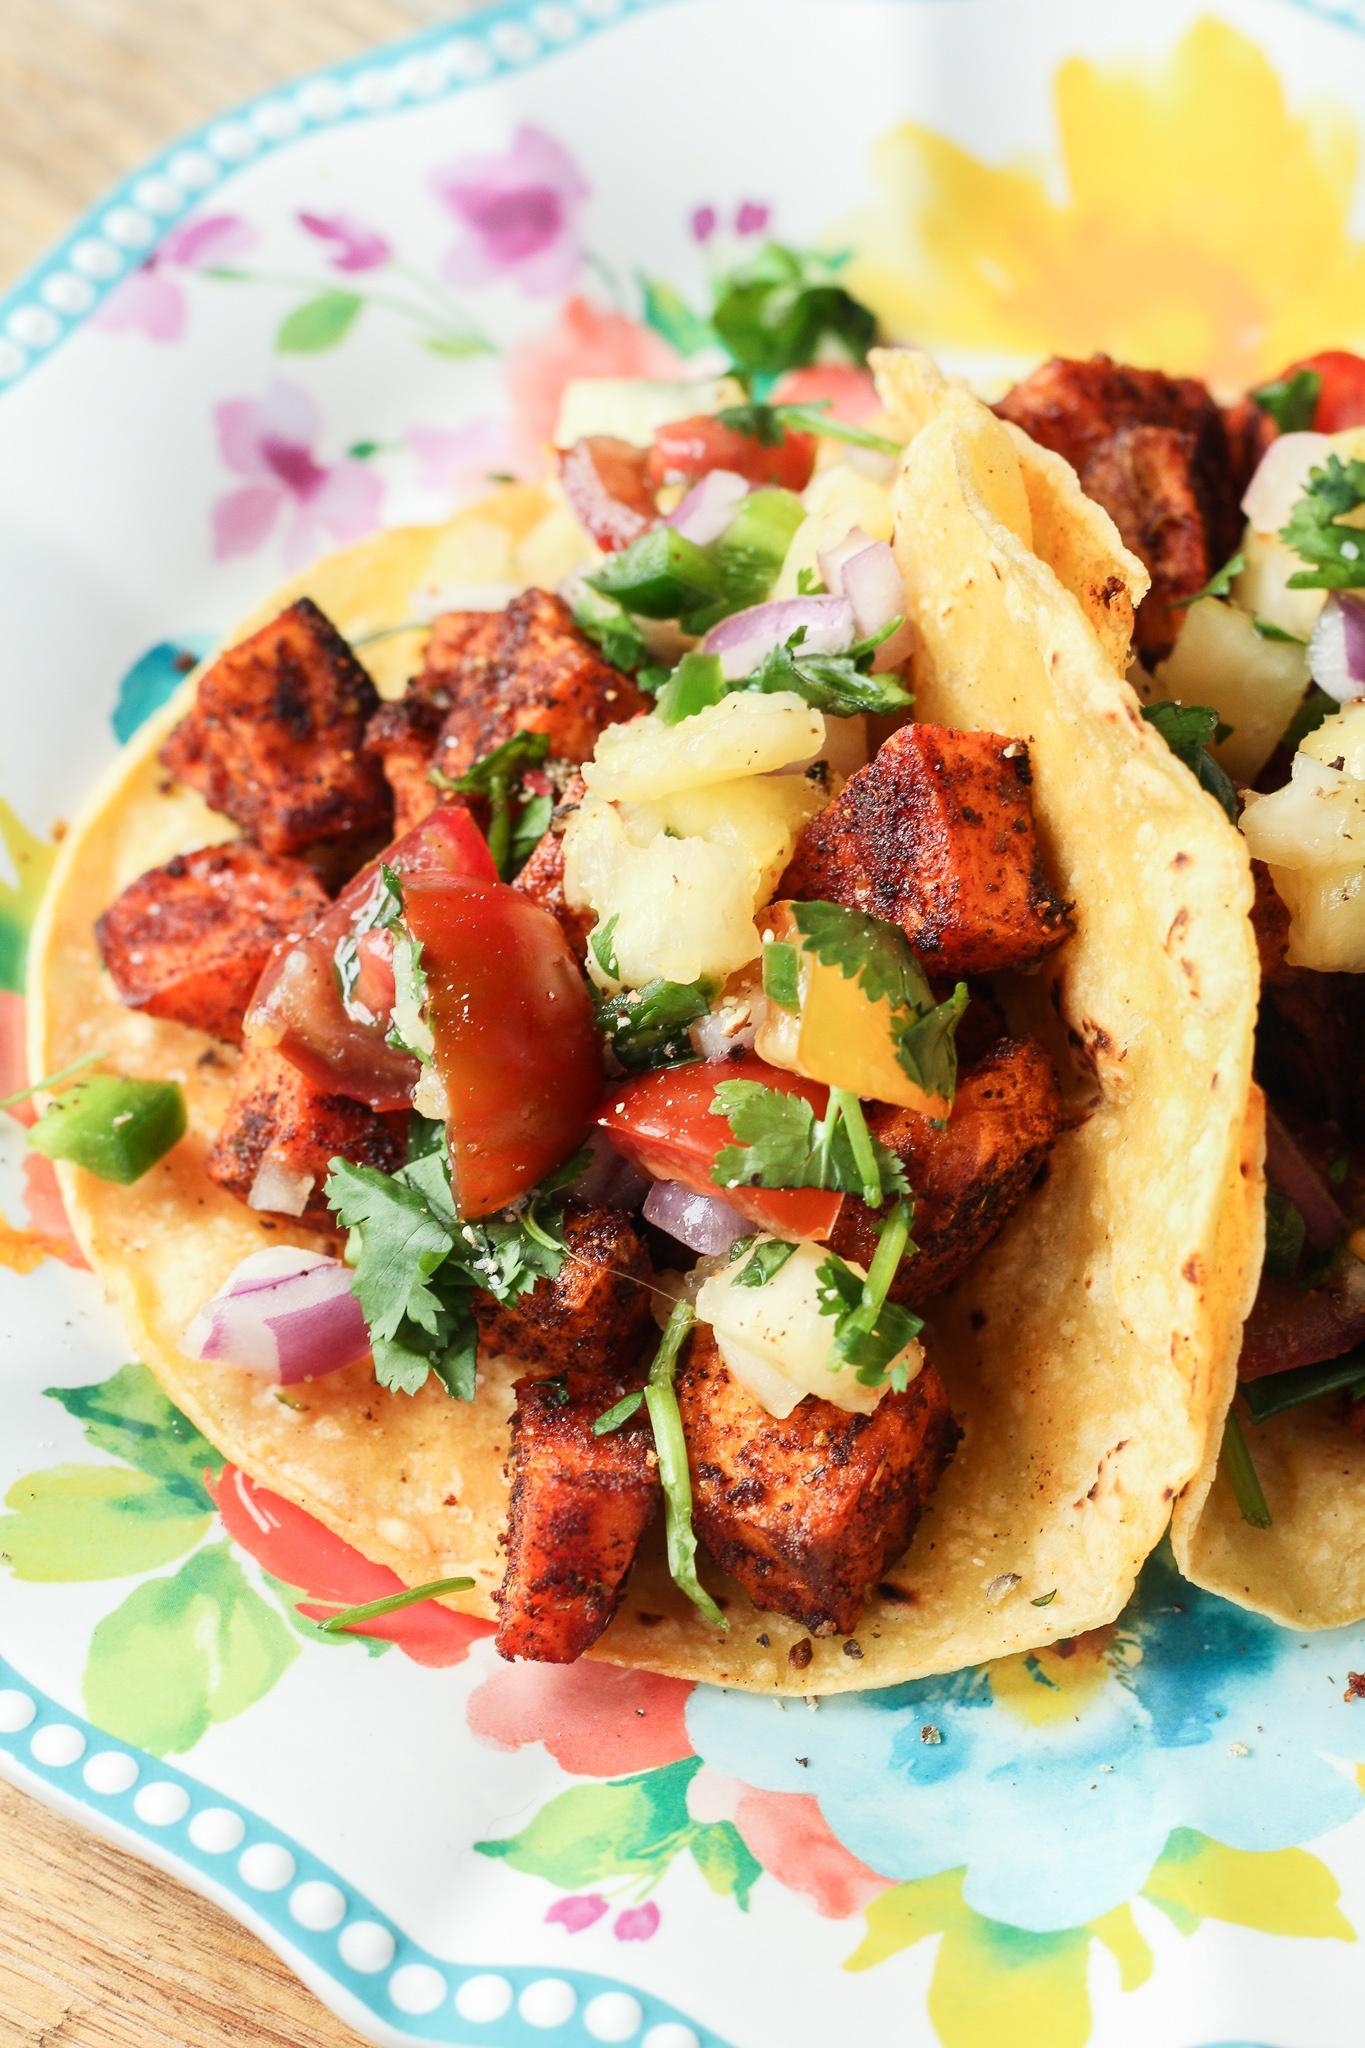 Sweet Potato Tacos with Pineapple Pico de Gallo